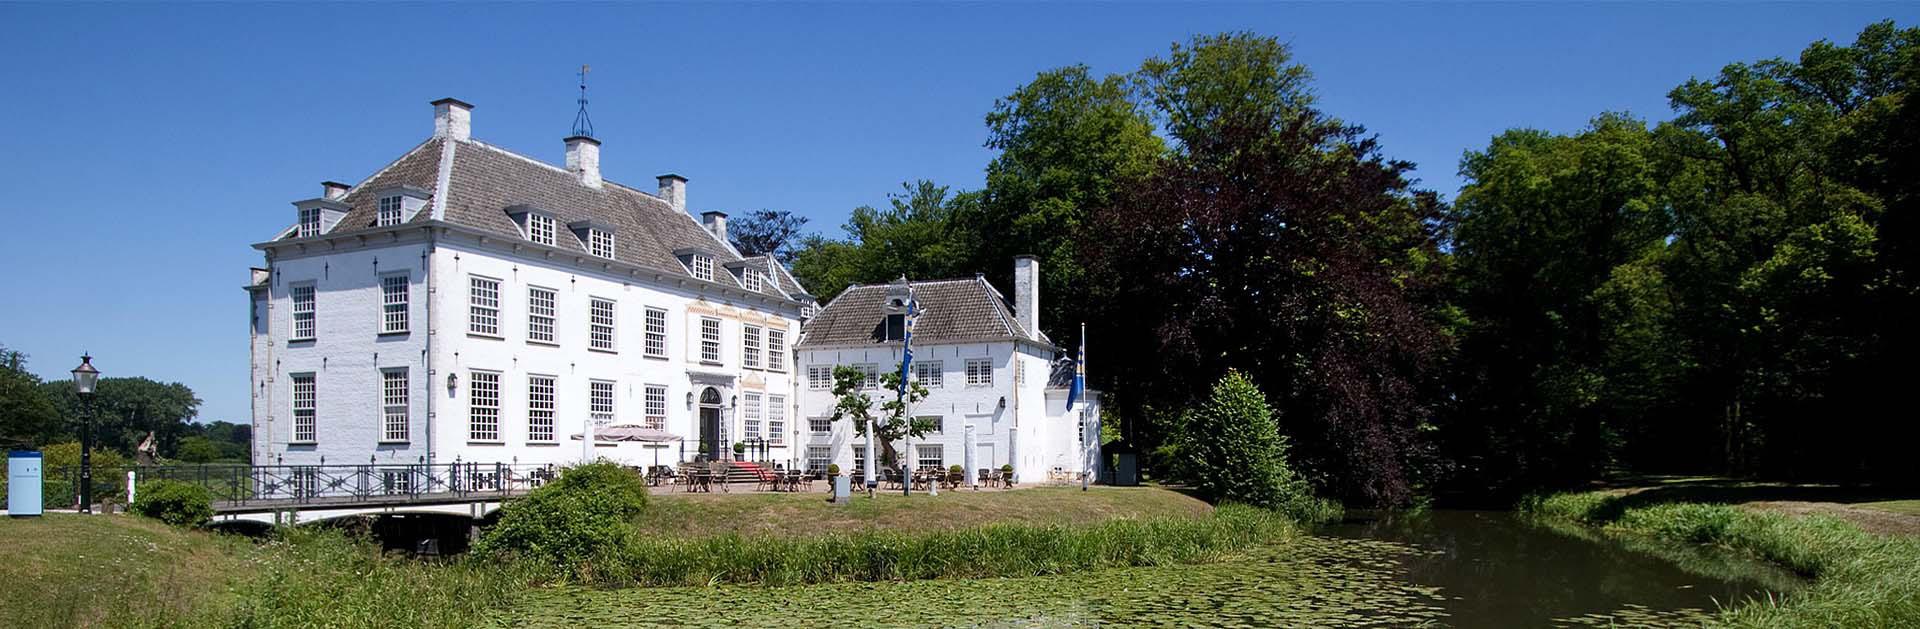 Huis 't Velde - Warnsveld Regio Achterhoek - Liemers